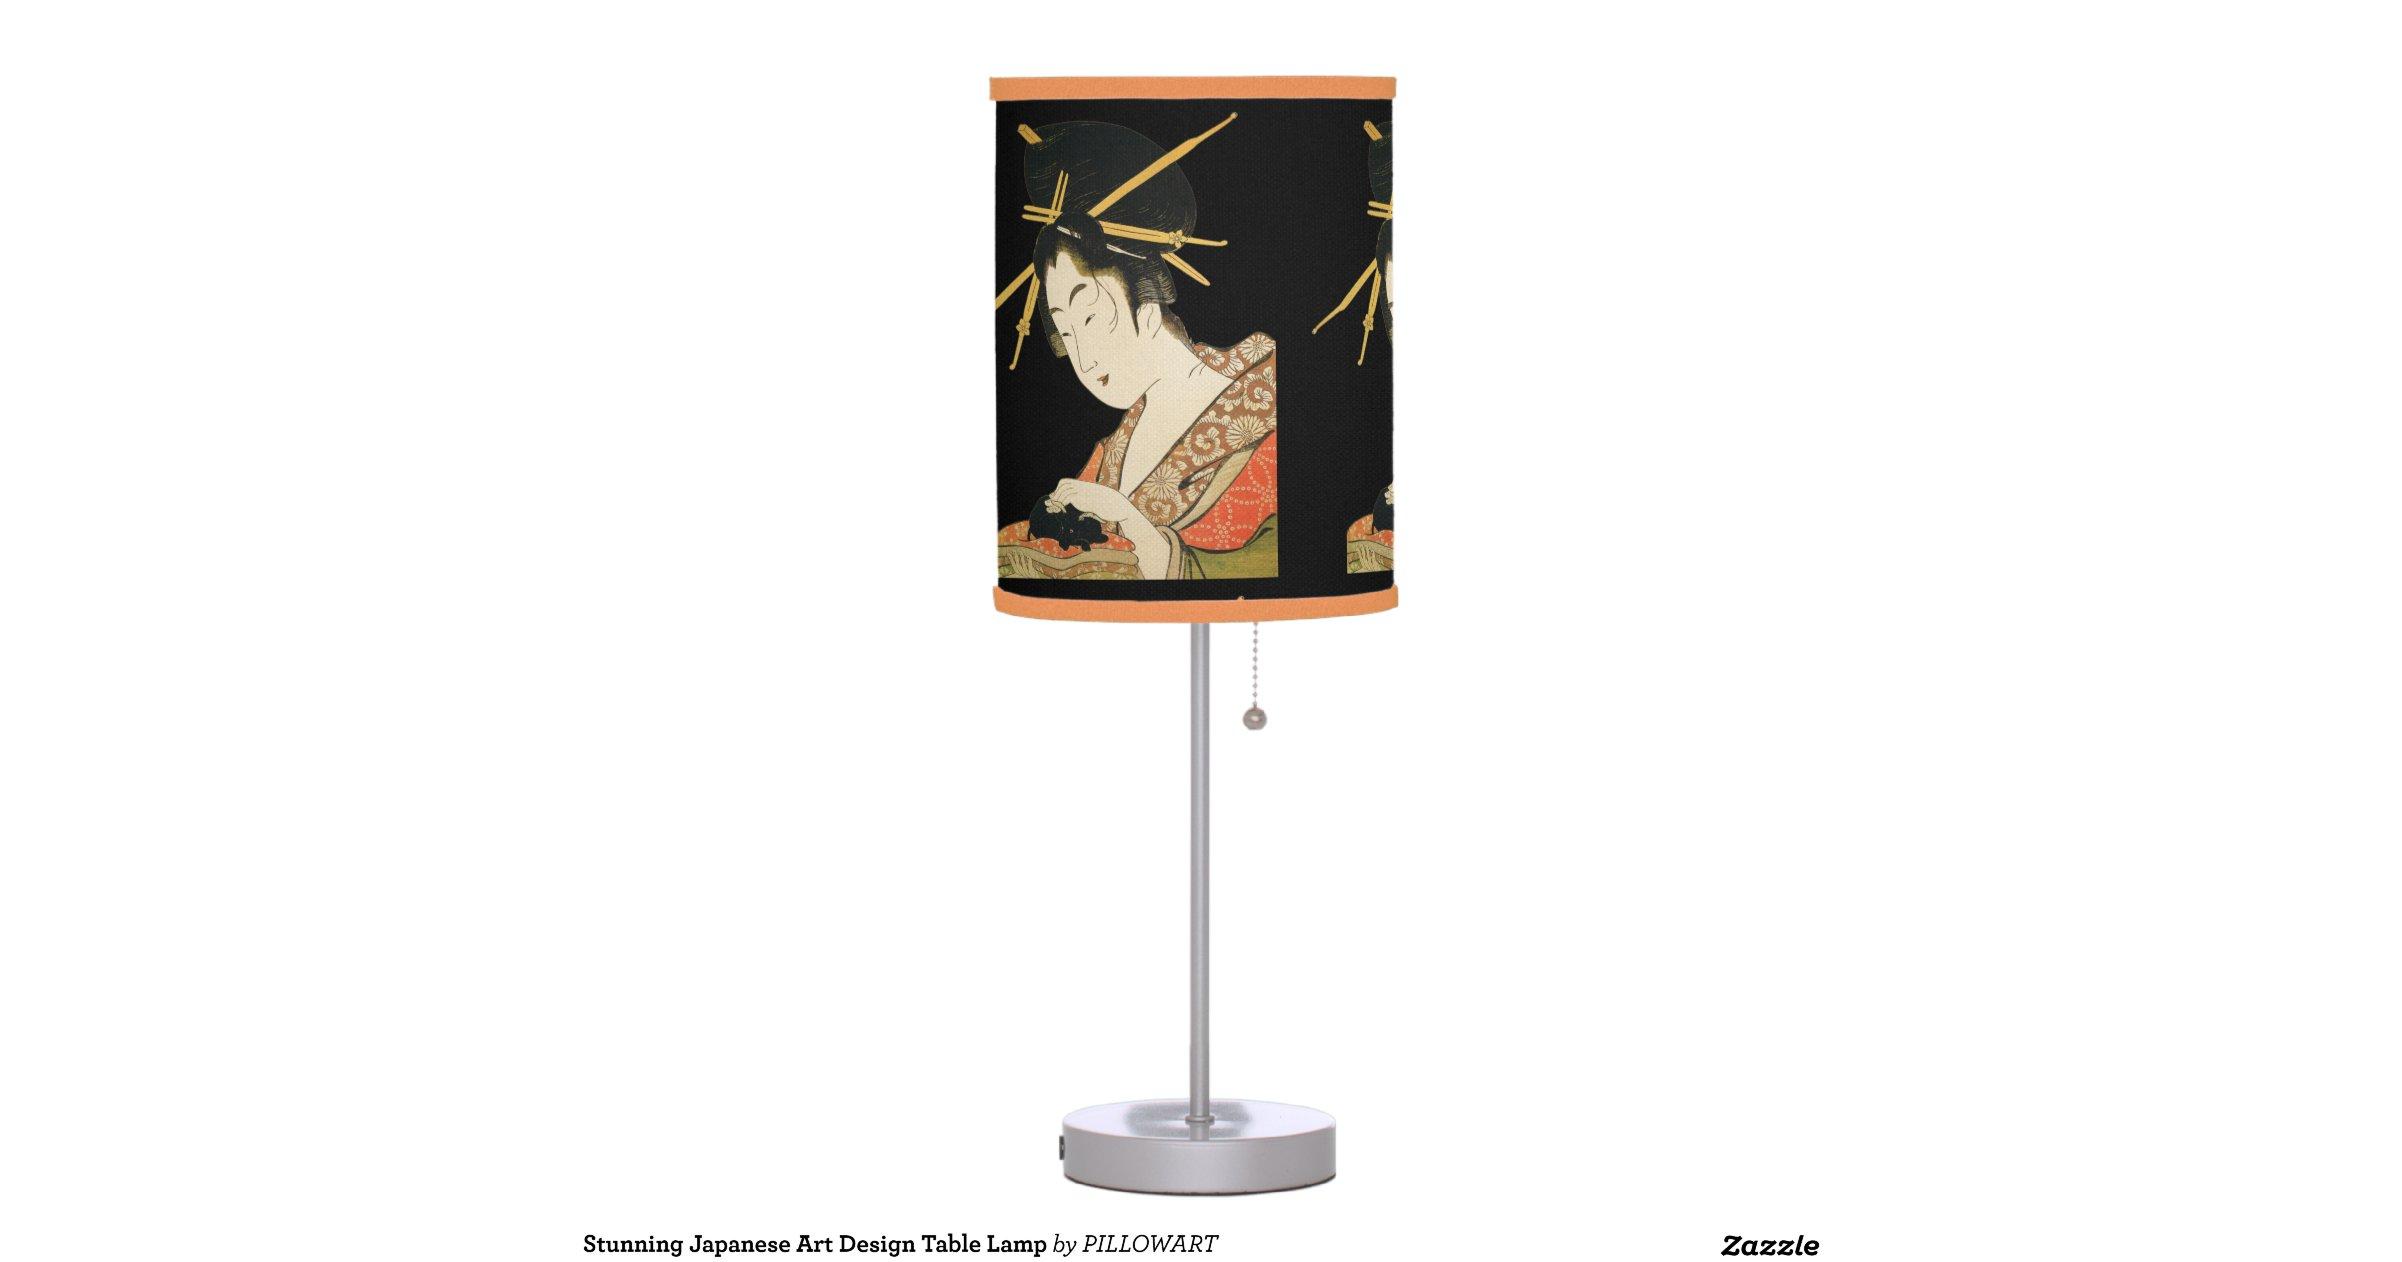 Stunning Japanese Art Design Table Lamp Zazzle